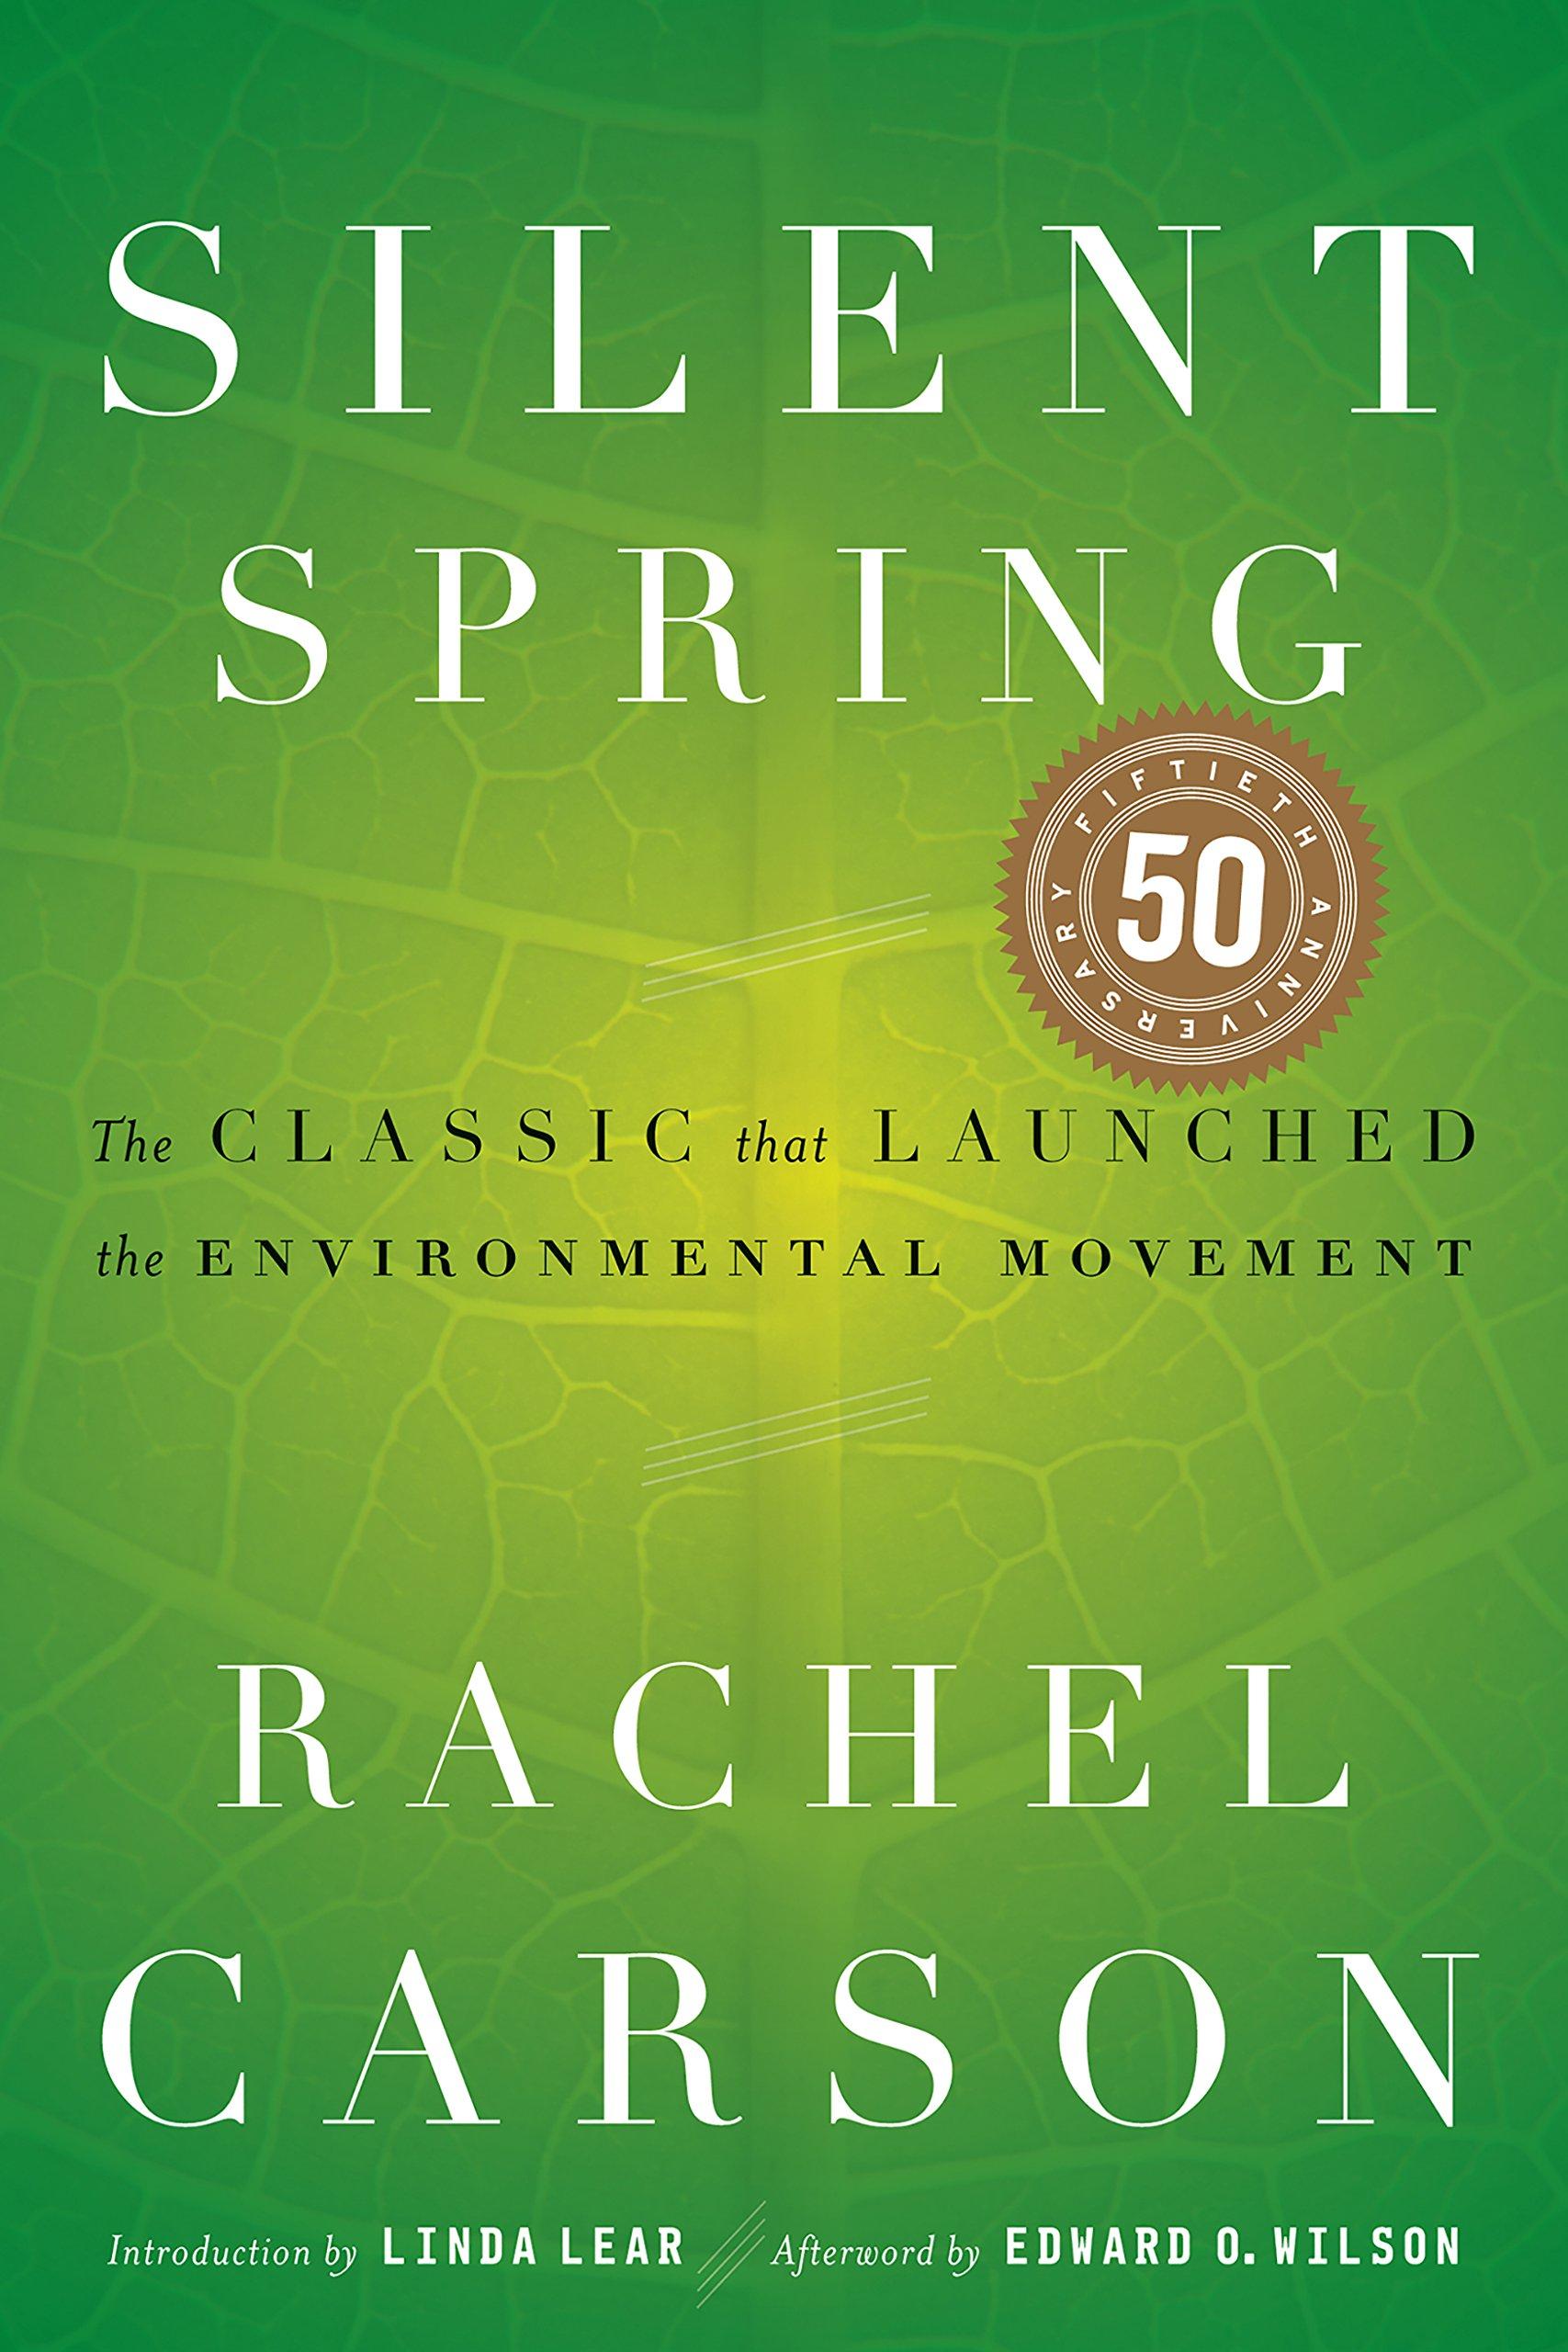 Amazon.com: Silent Spring eBook: Carson, Rachel, Linda Lear ...